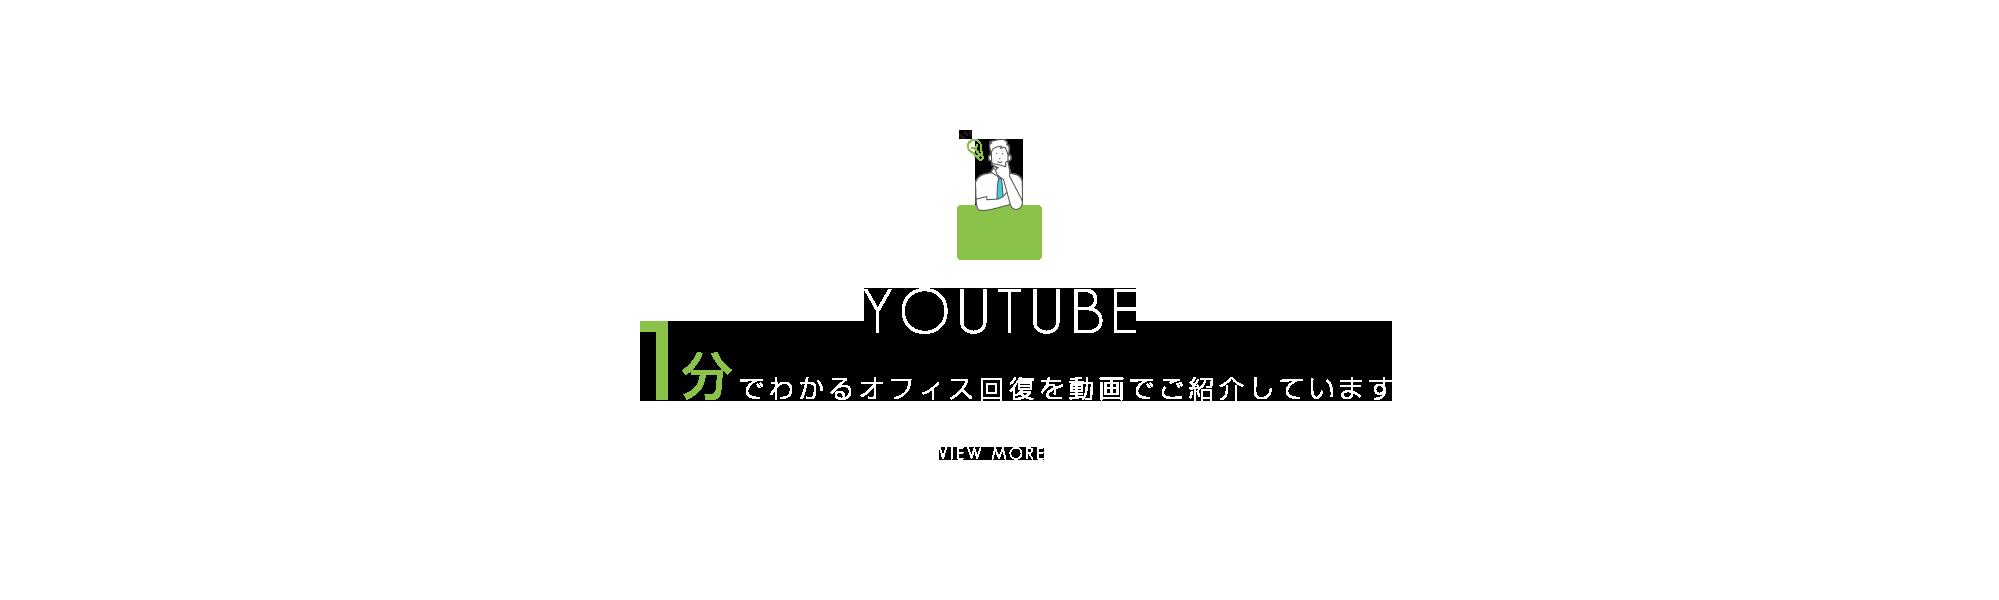 top_youtube_bg